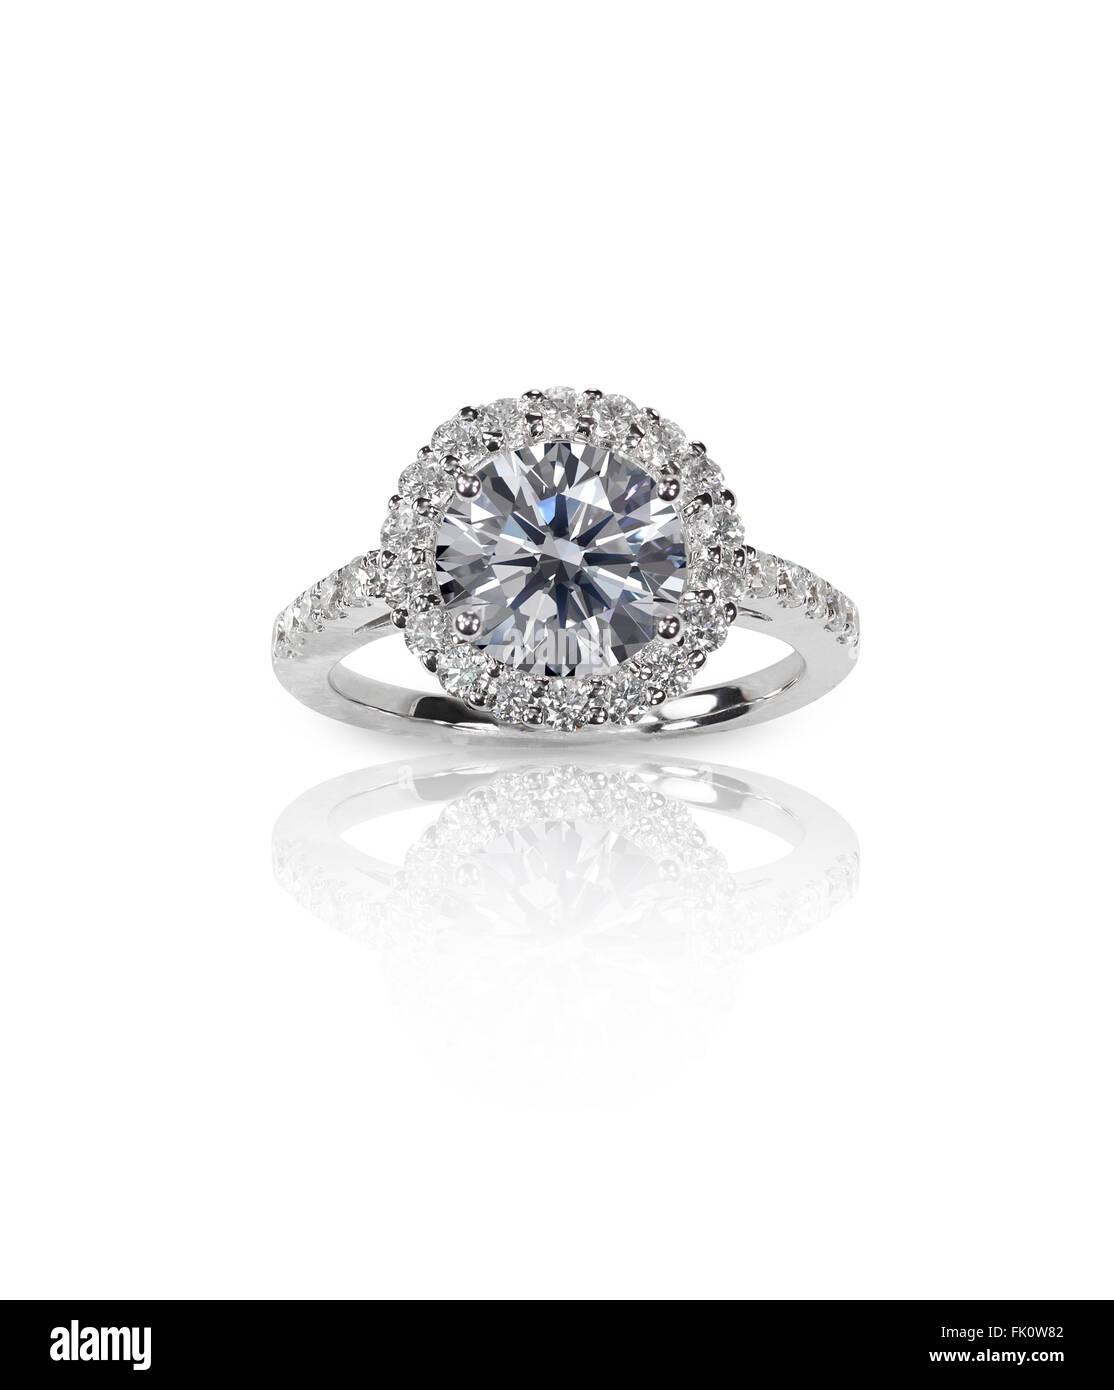 Beautiful Diamond Engagemnt Solitair Wedding band Ring - Stock Image